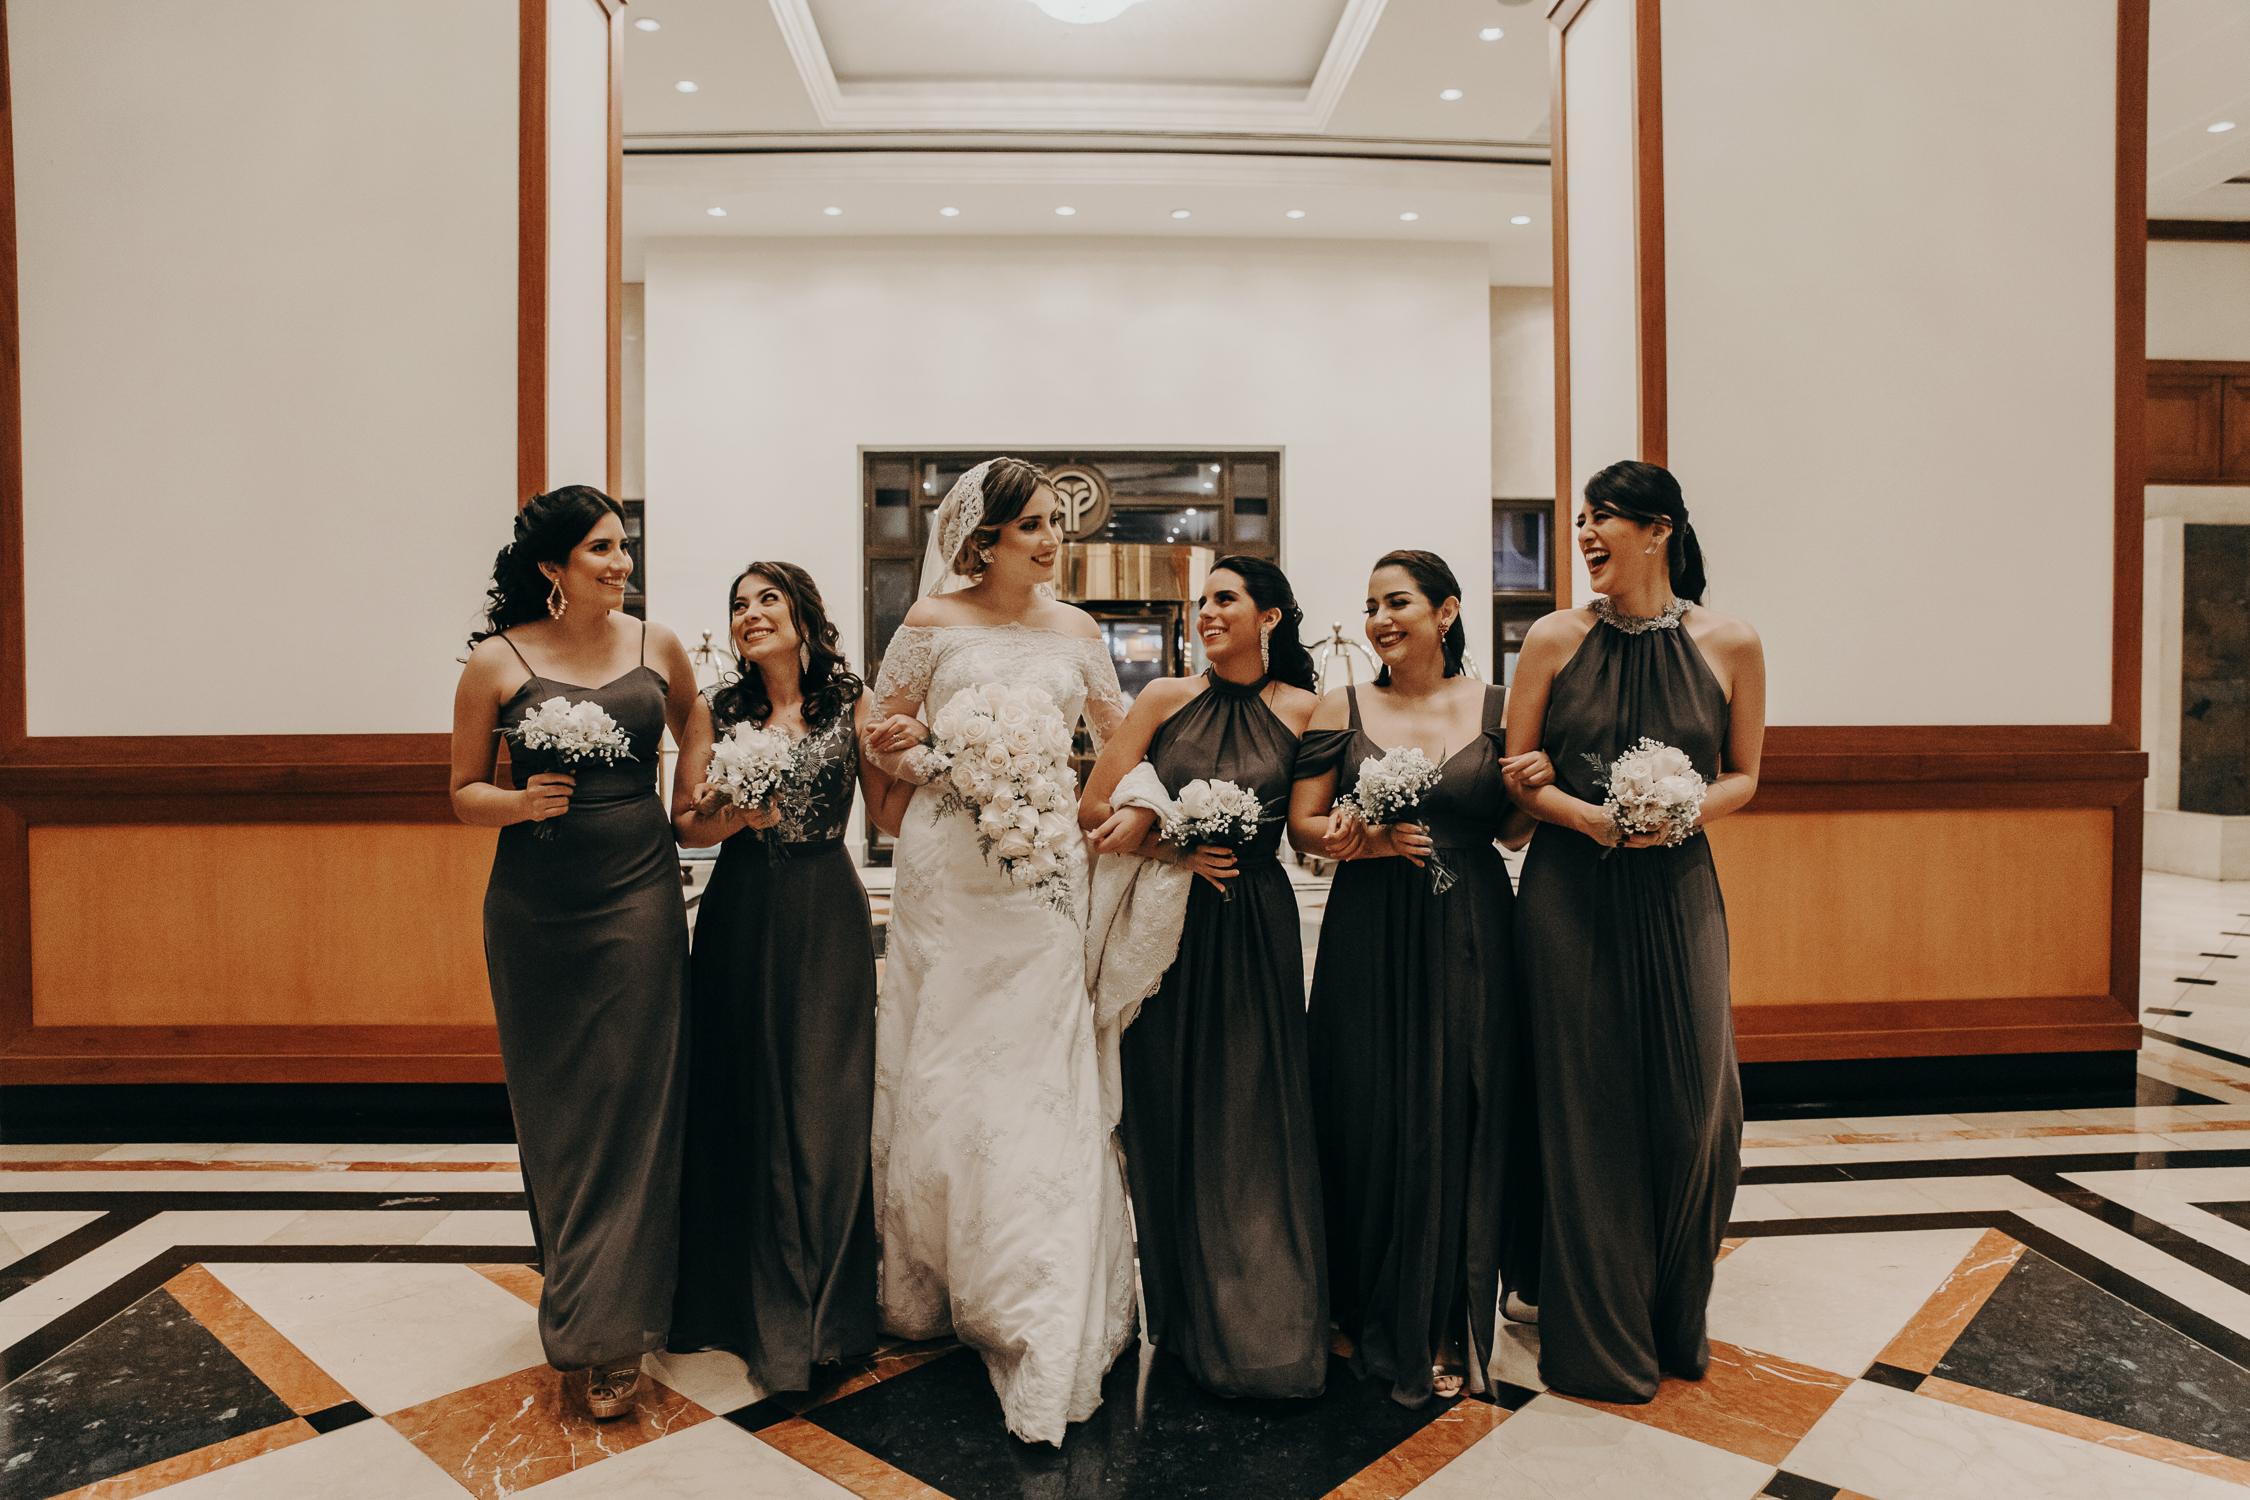 Michelle-Agurto-Fotografia-Bodas-Ecuador-Destination-Wedding-Photographer-Vicky-Javier-38.JPG